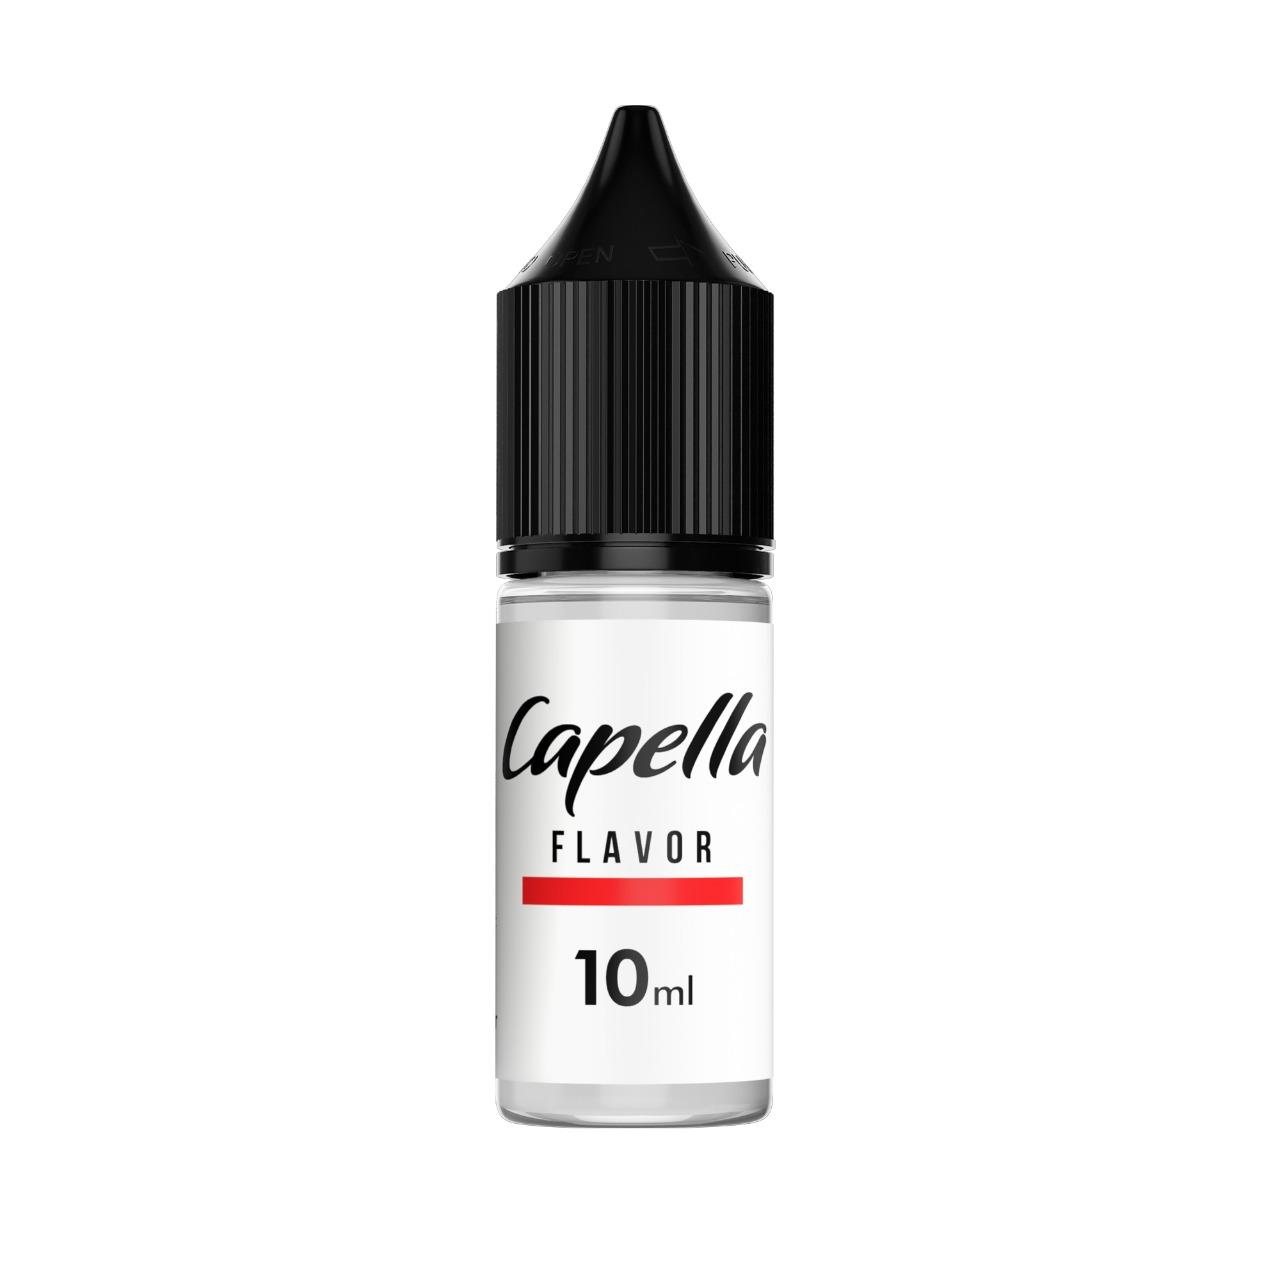 Capella (CAP) Marshmallow 10ml